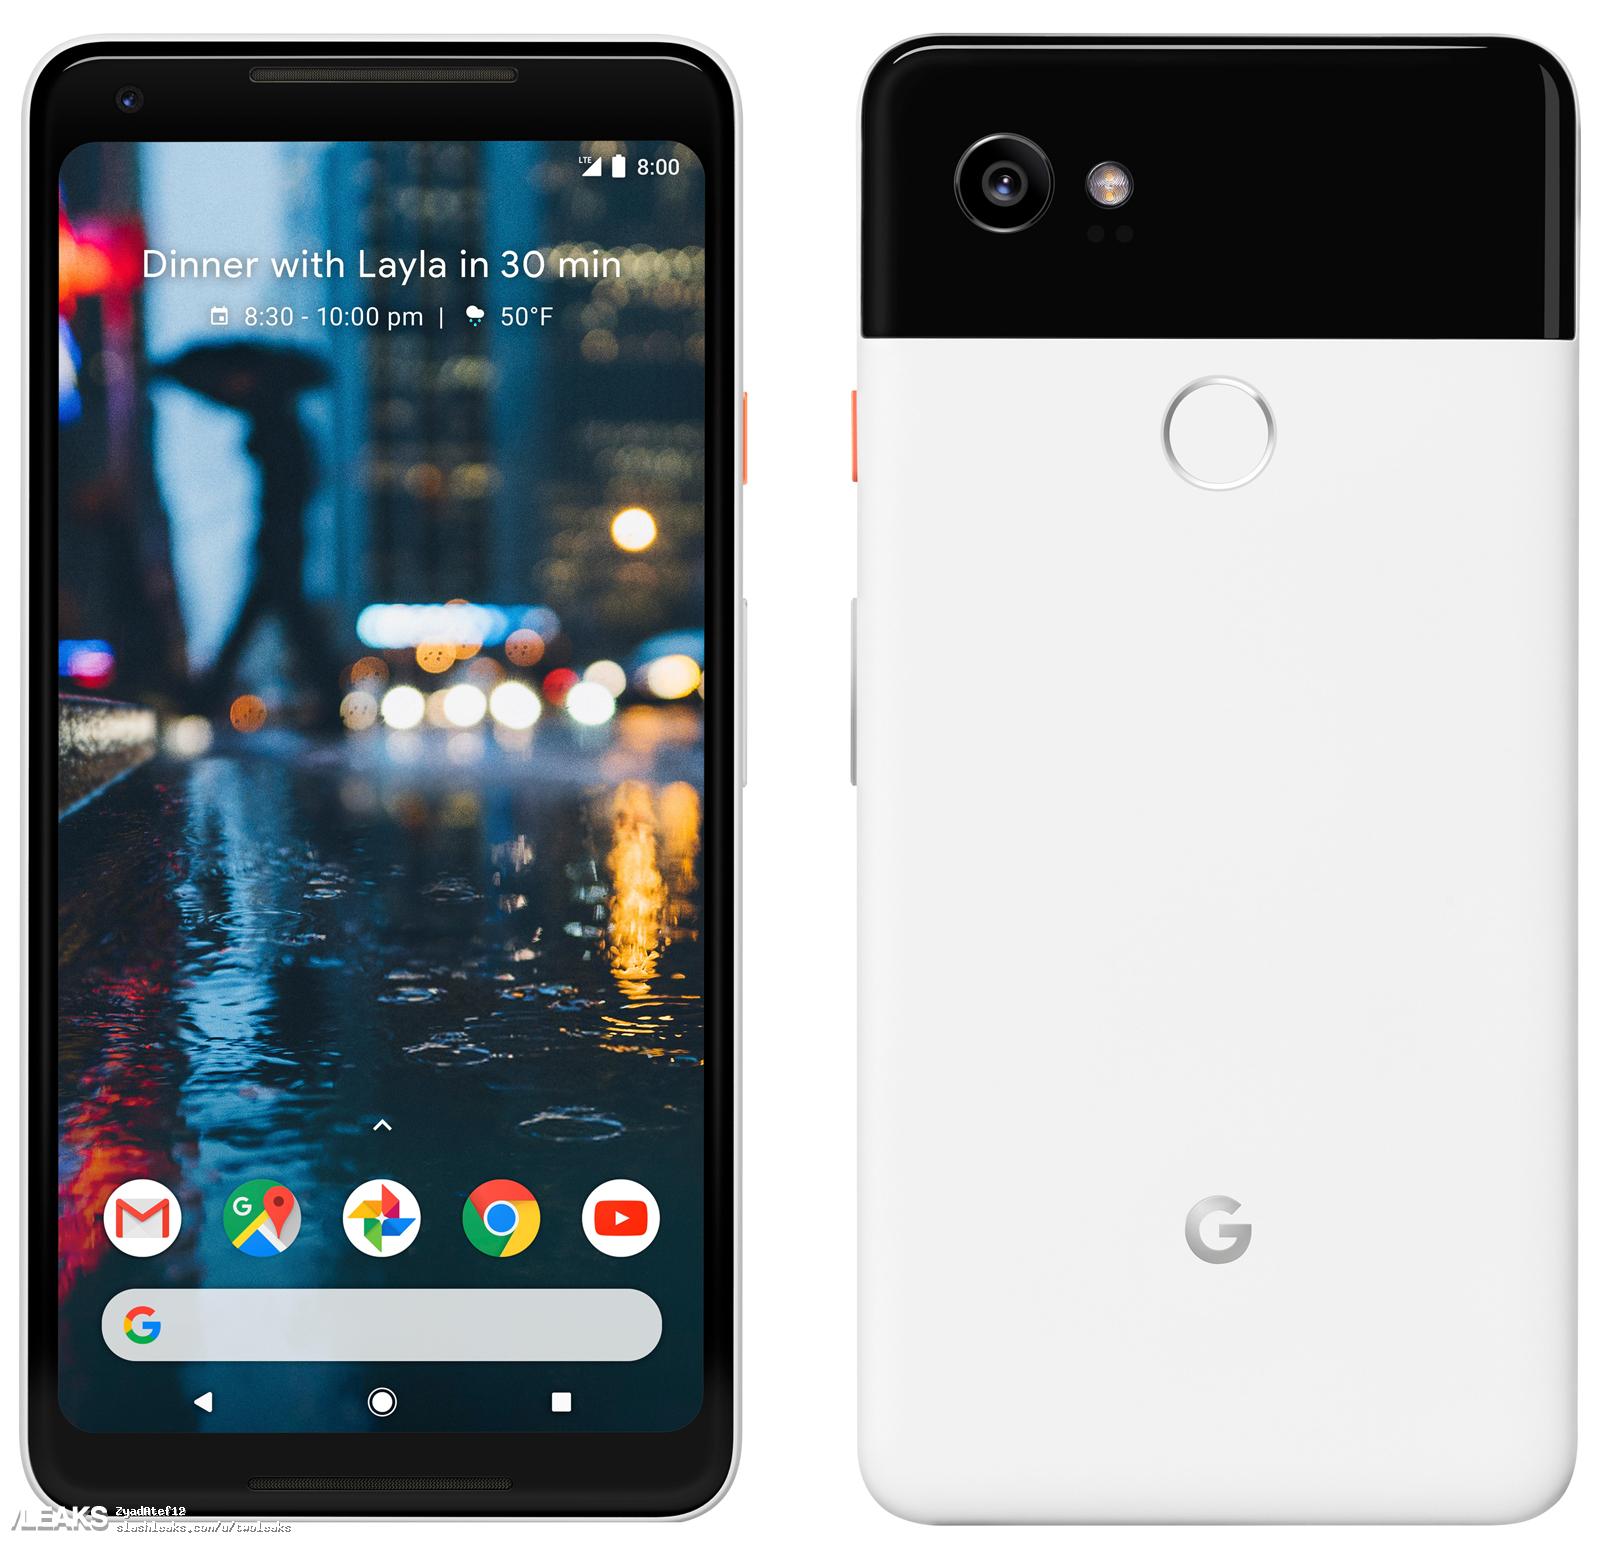 img Google Pixel 2 XL press render and specs leaked by Evan Blass